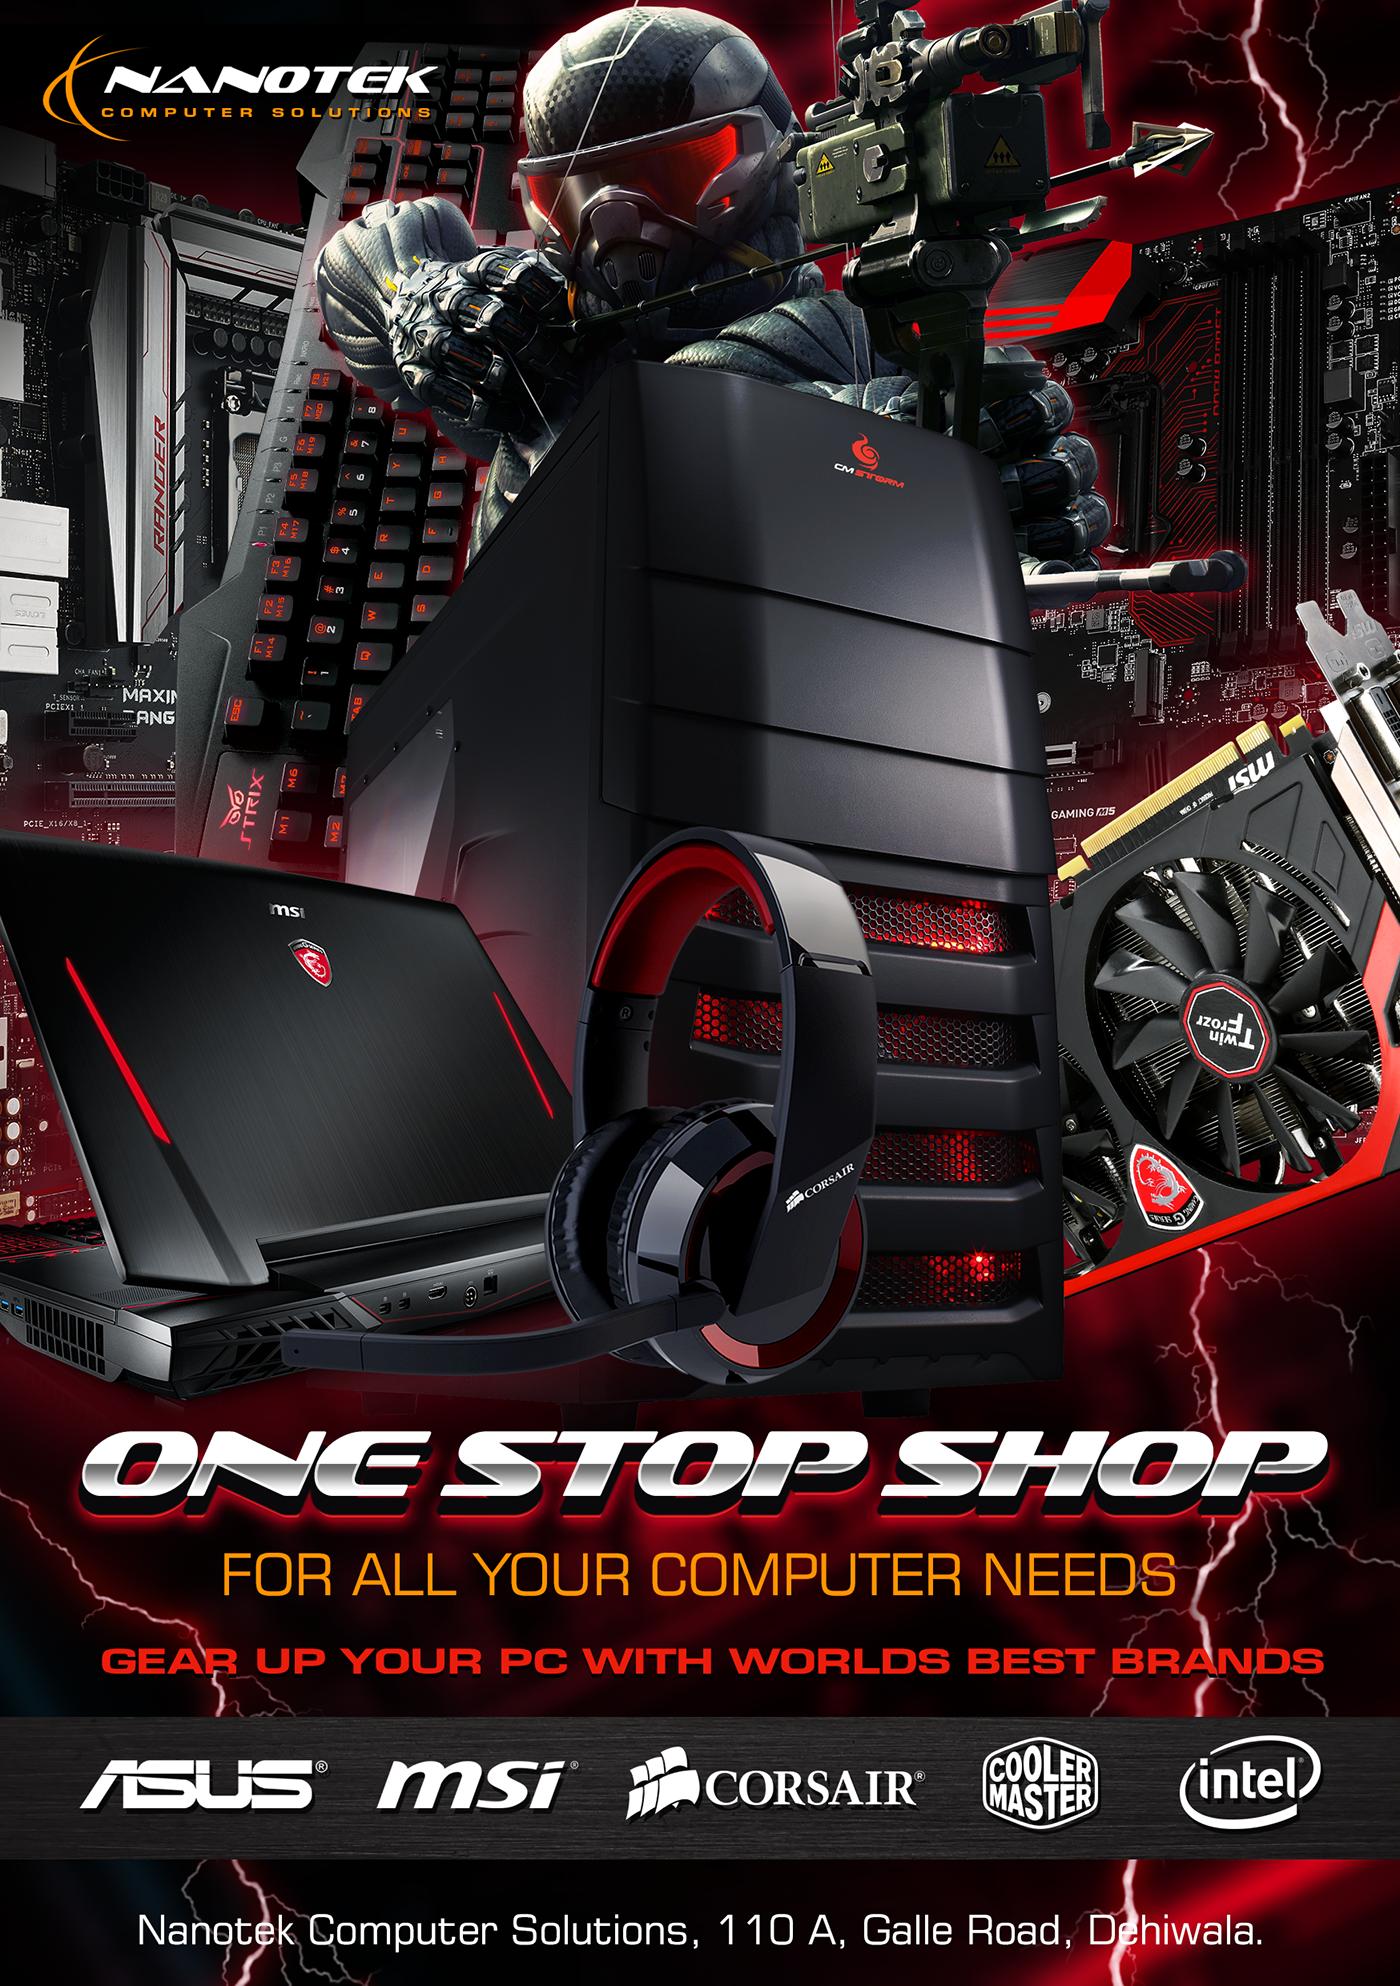 computer shop computer hardware pc shop Flyer Design red & black Gaming gaming pc red black